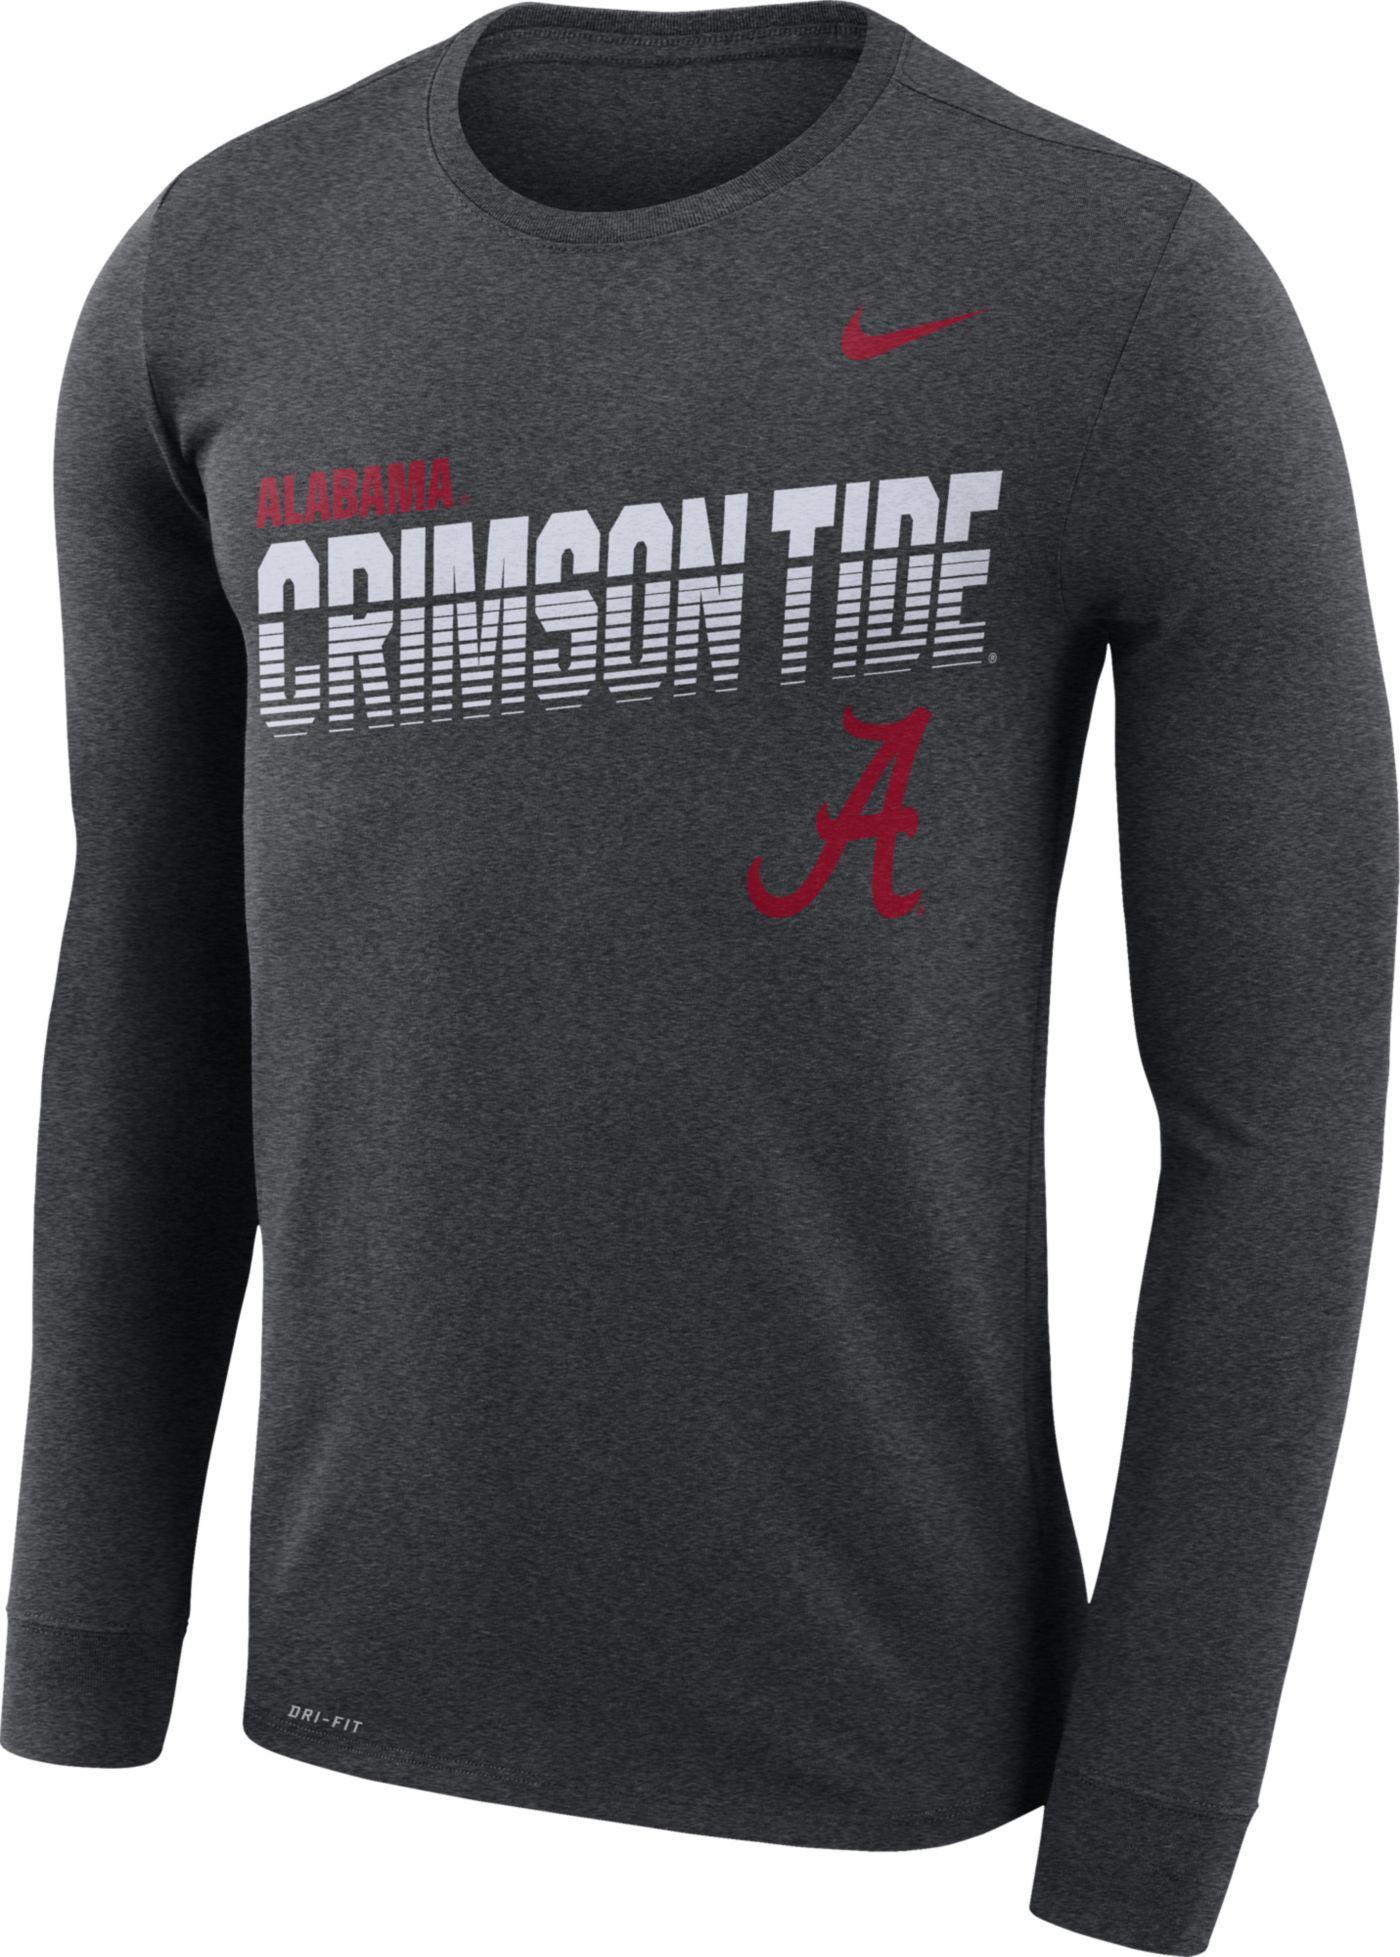 Nike Men's Alabama Crimson Tide Grey Legend Football Sideline Long Sleeve T-Shirt